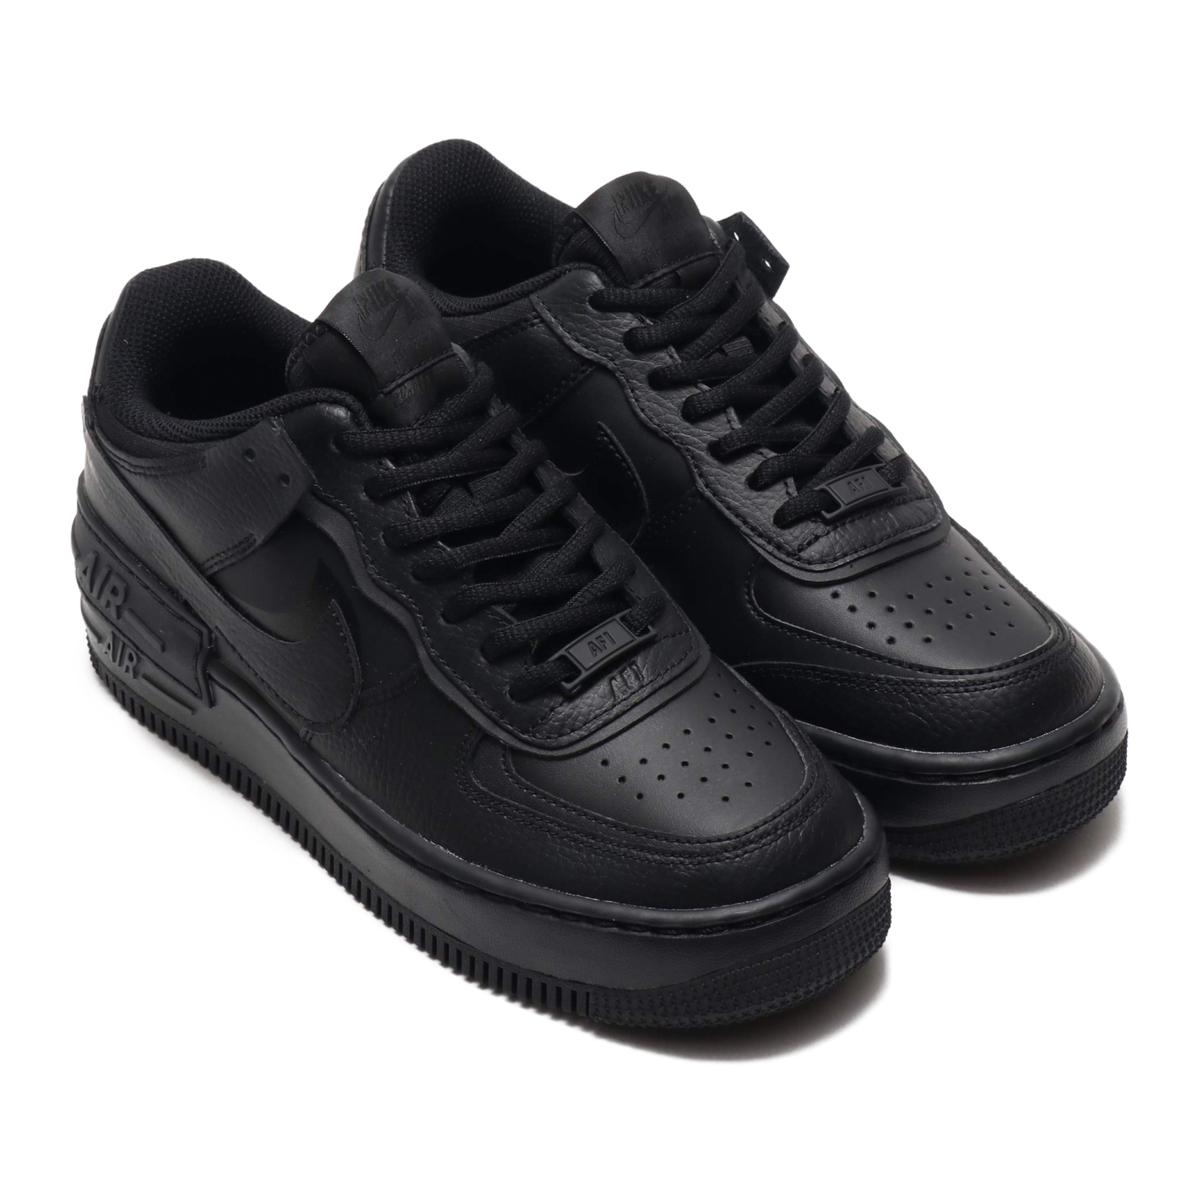 f:id:sneakerscaffetokyo:20190930151043j:plain